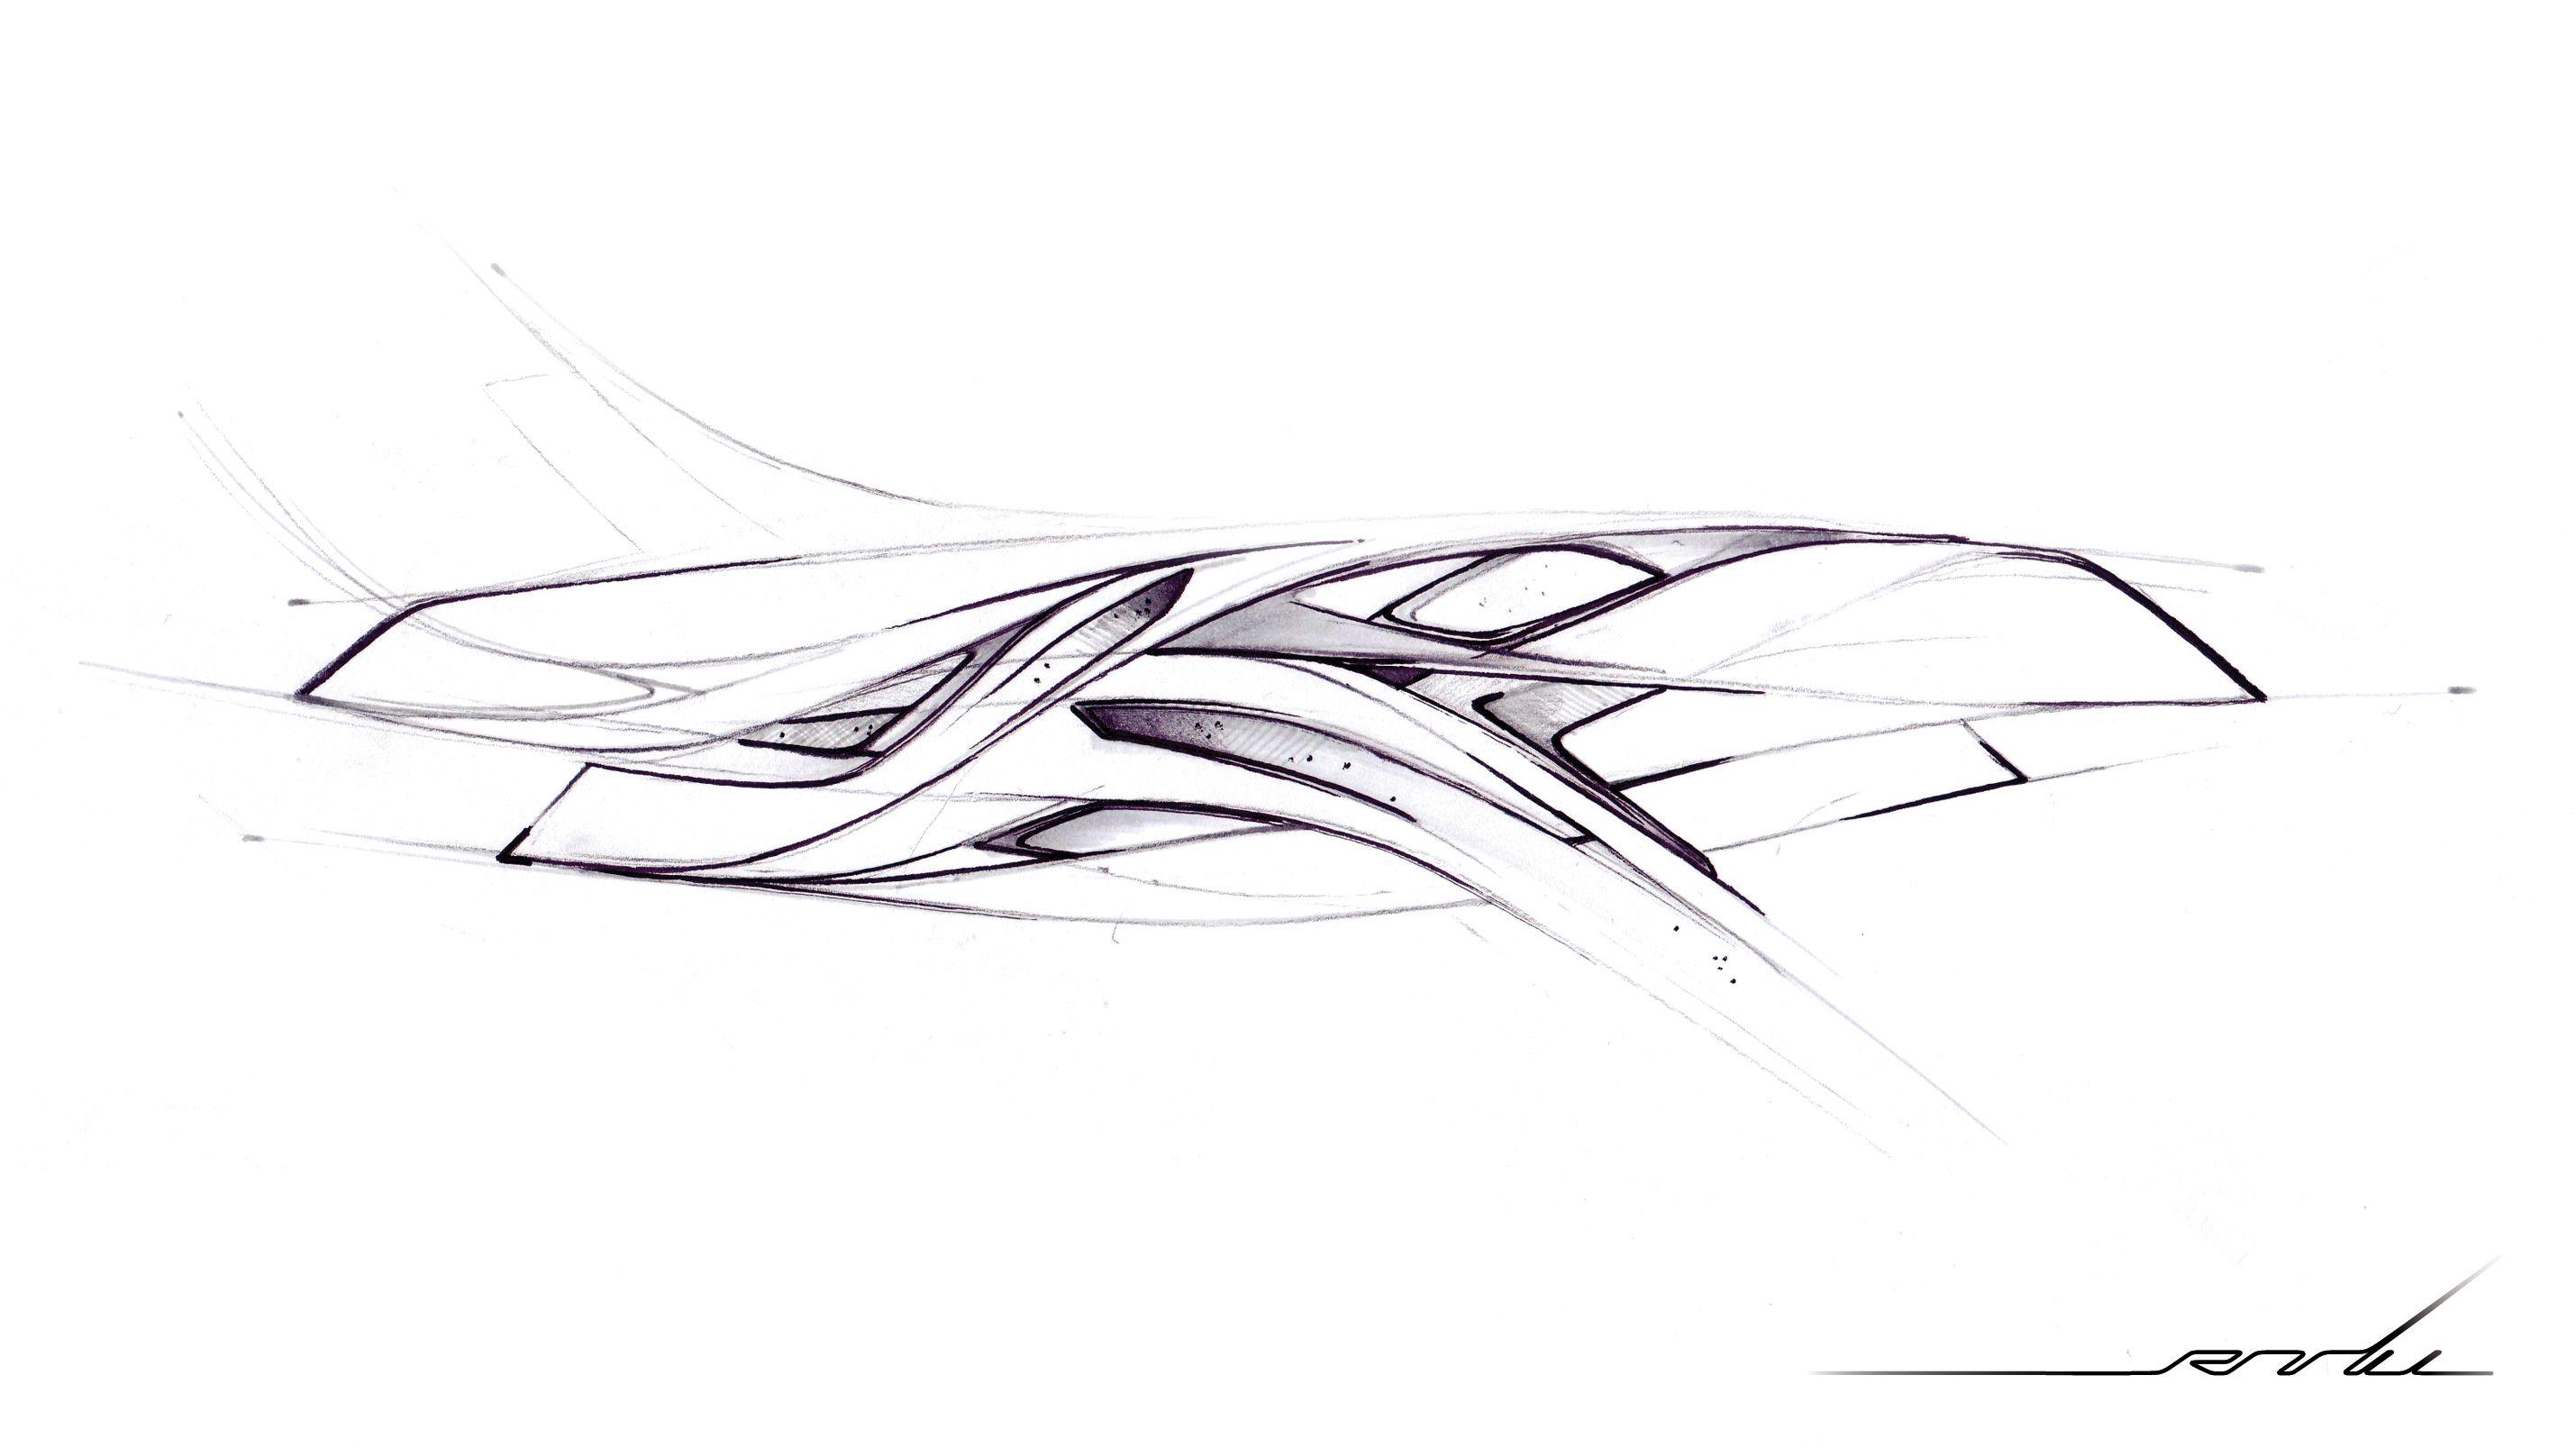 Concept Art Form Finding Atmospheres Design Strategies